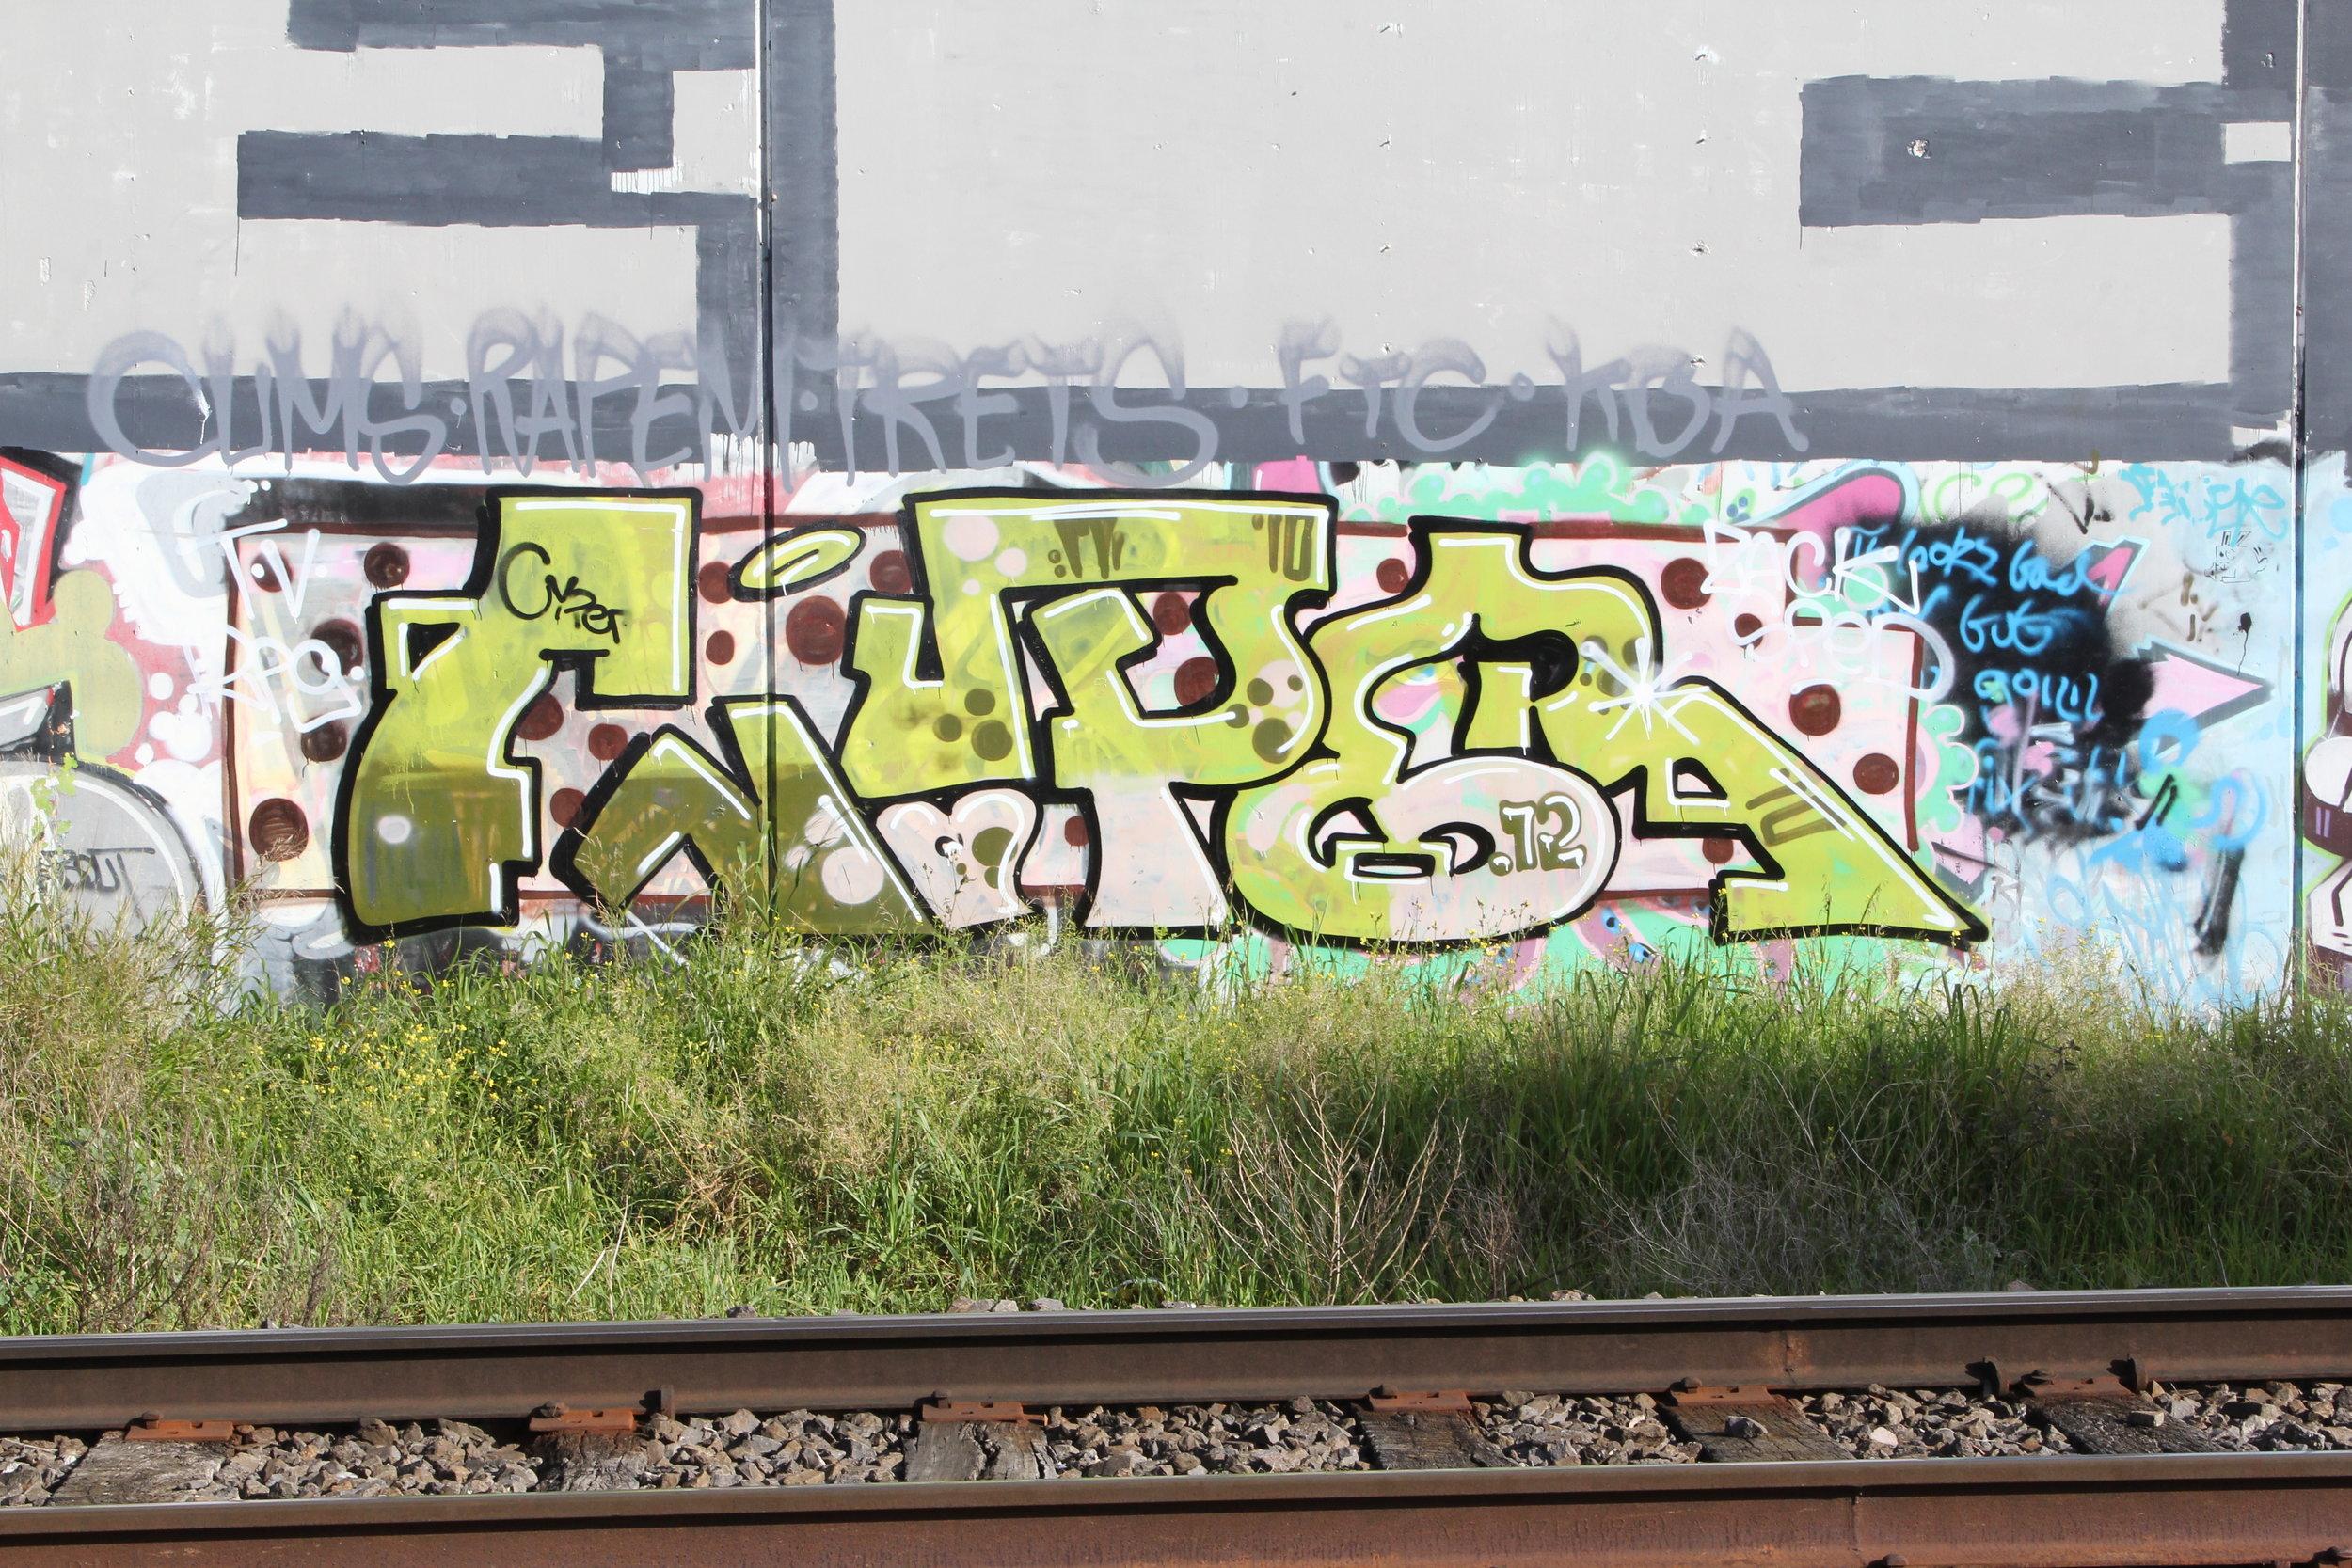 IMG_0090.JPG